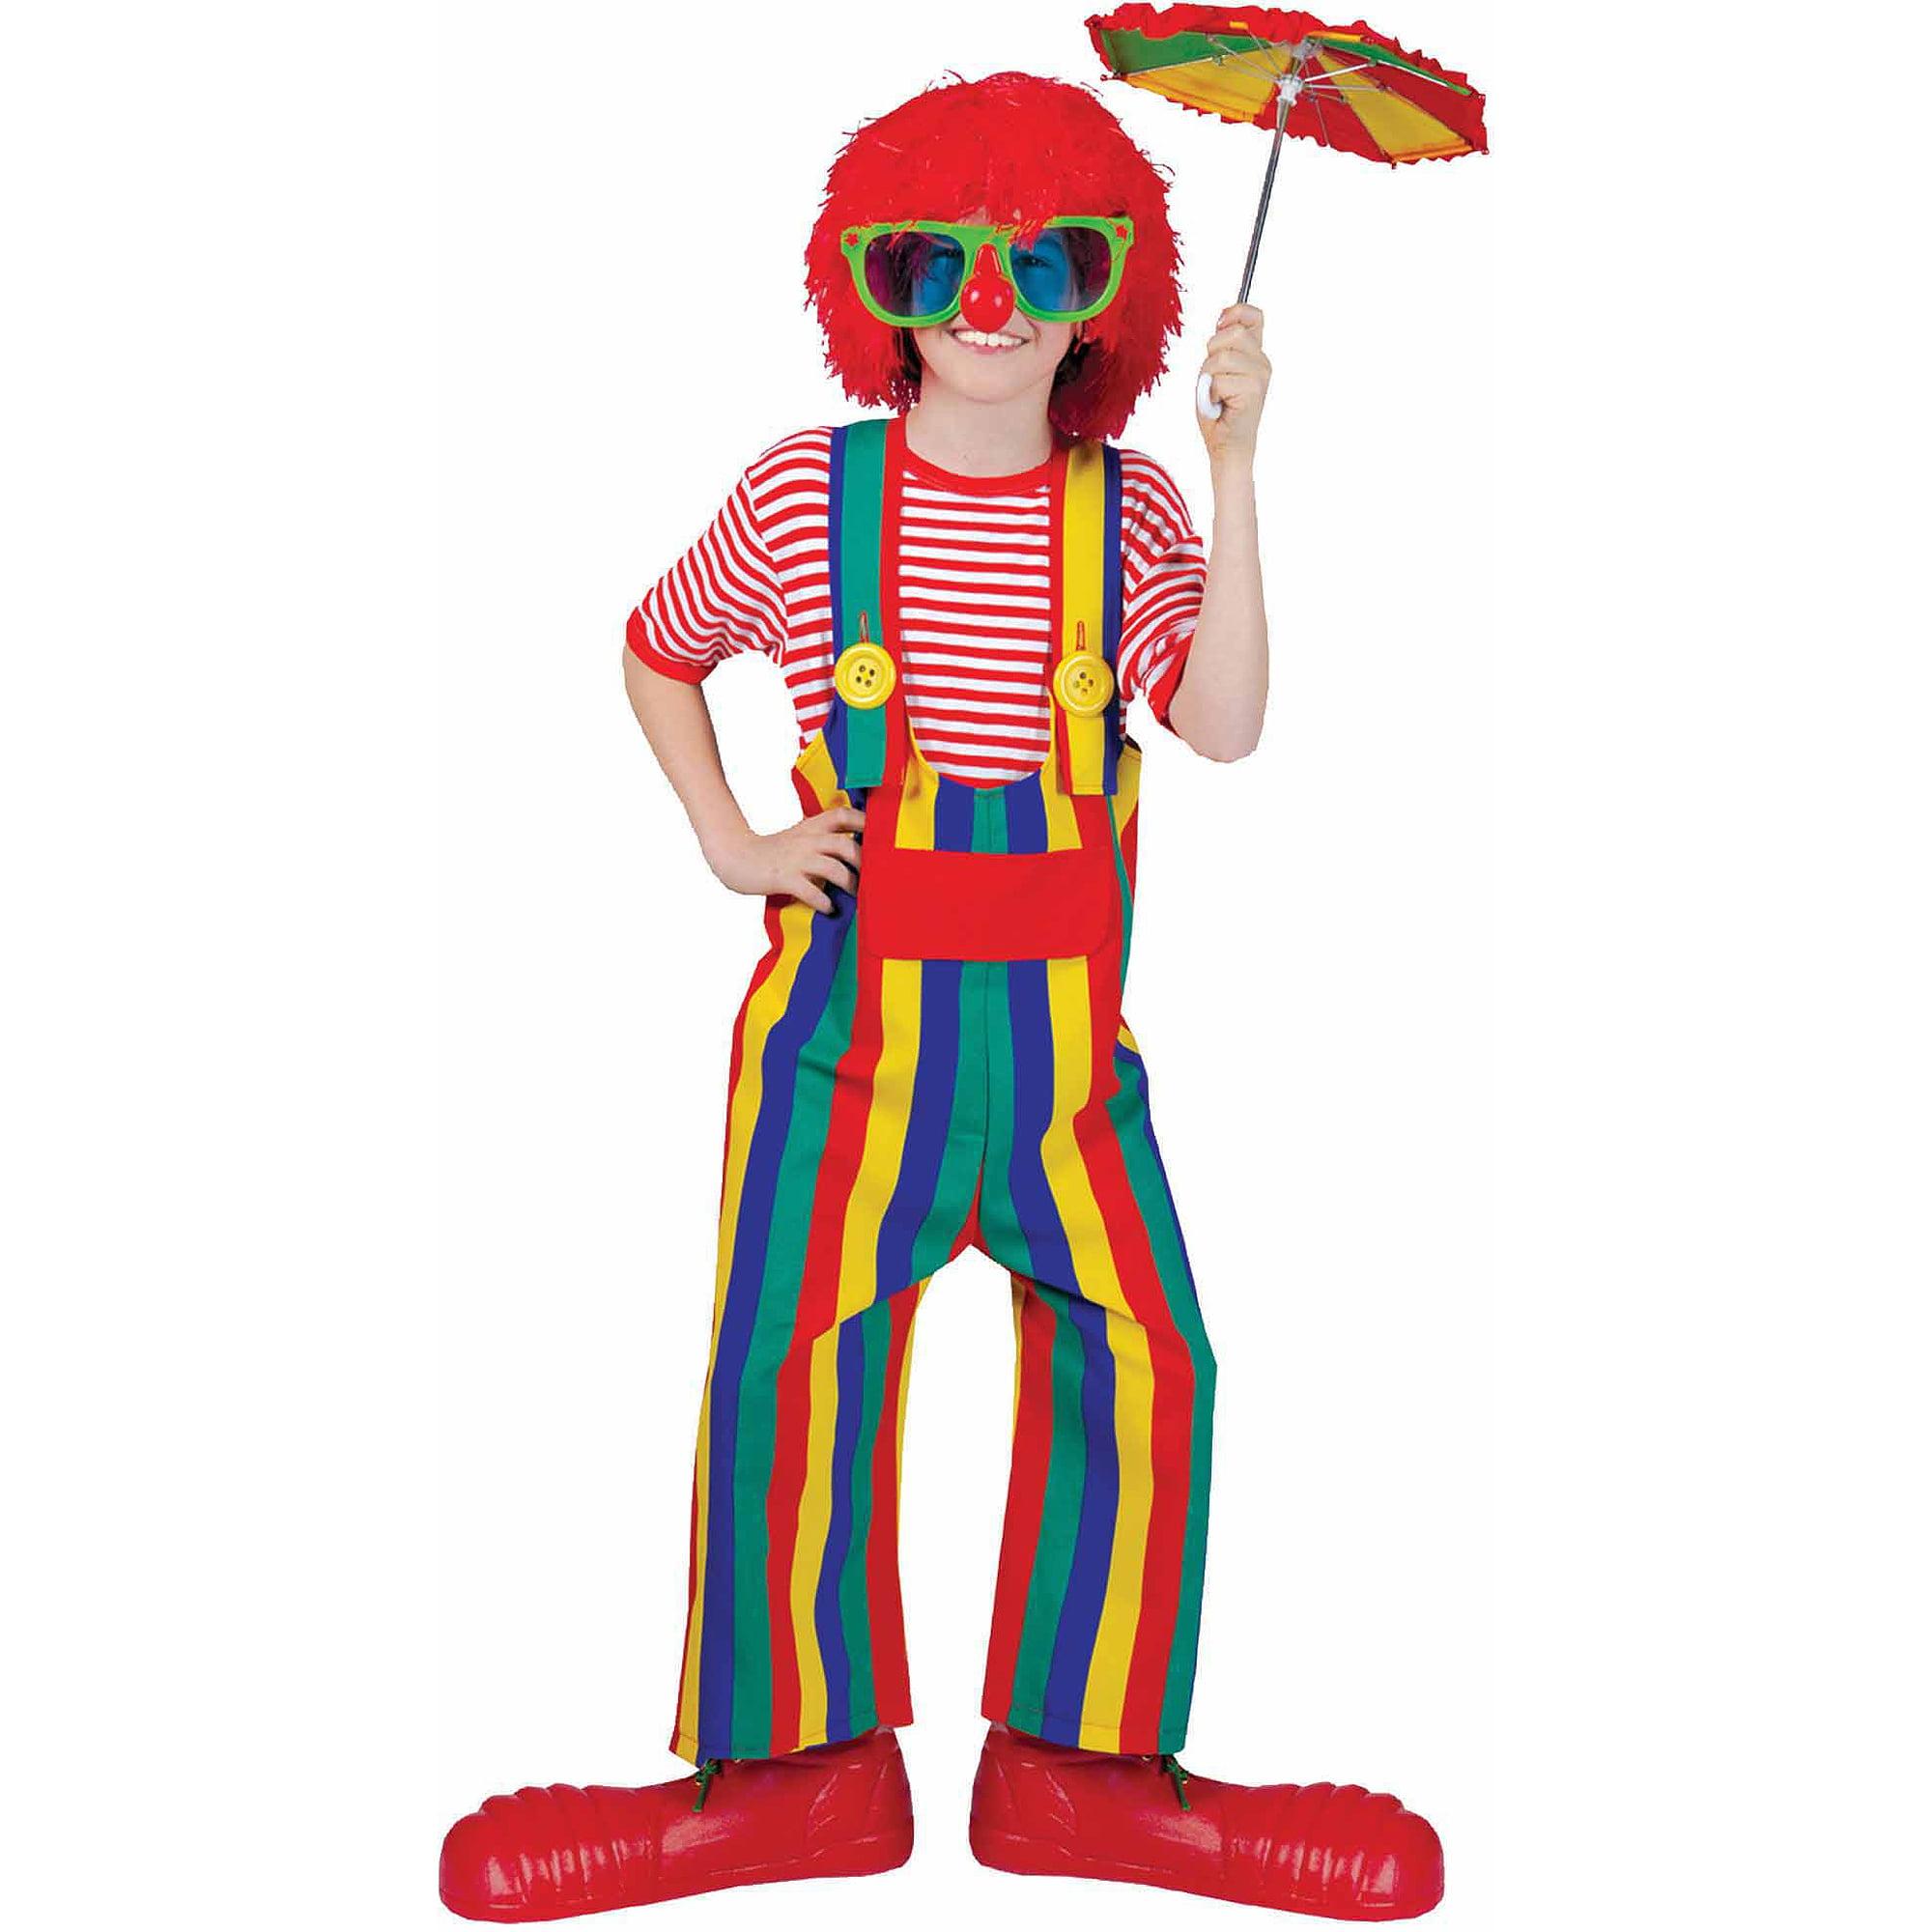 Striped Clown Overalls Child Halloween Costume